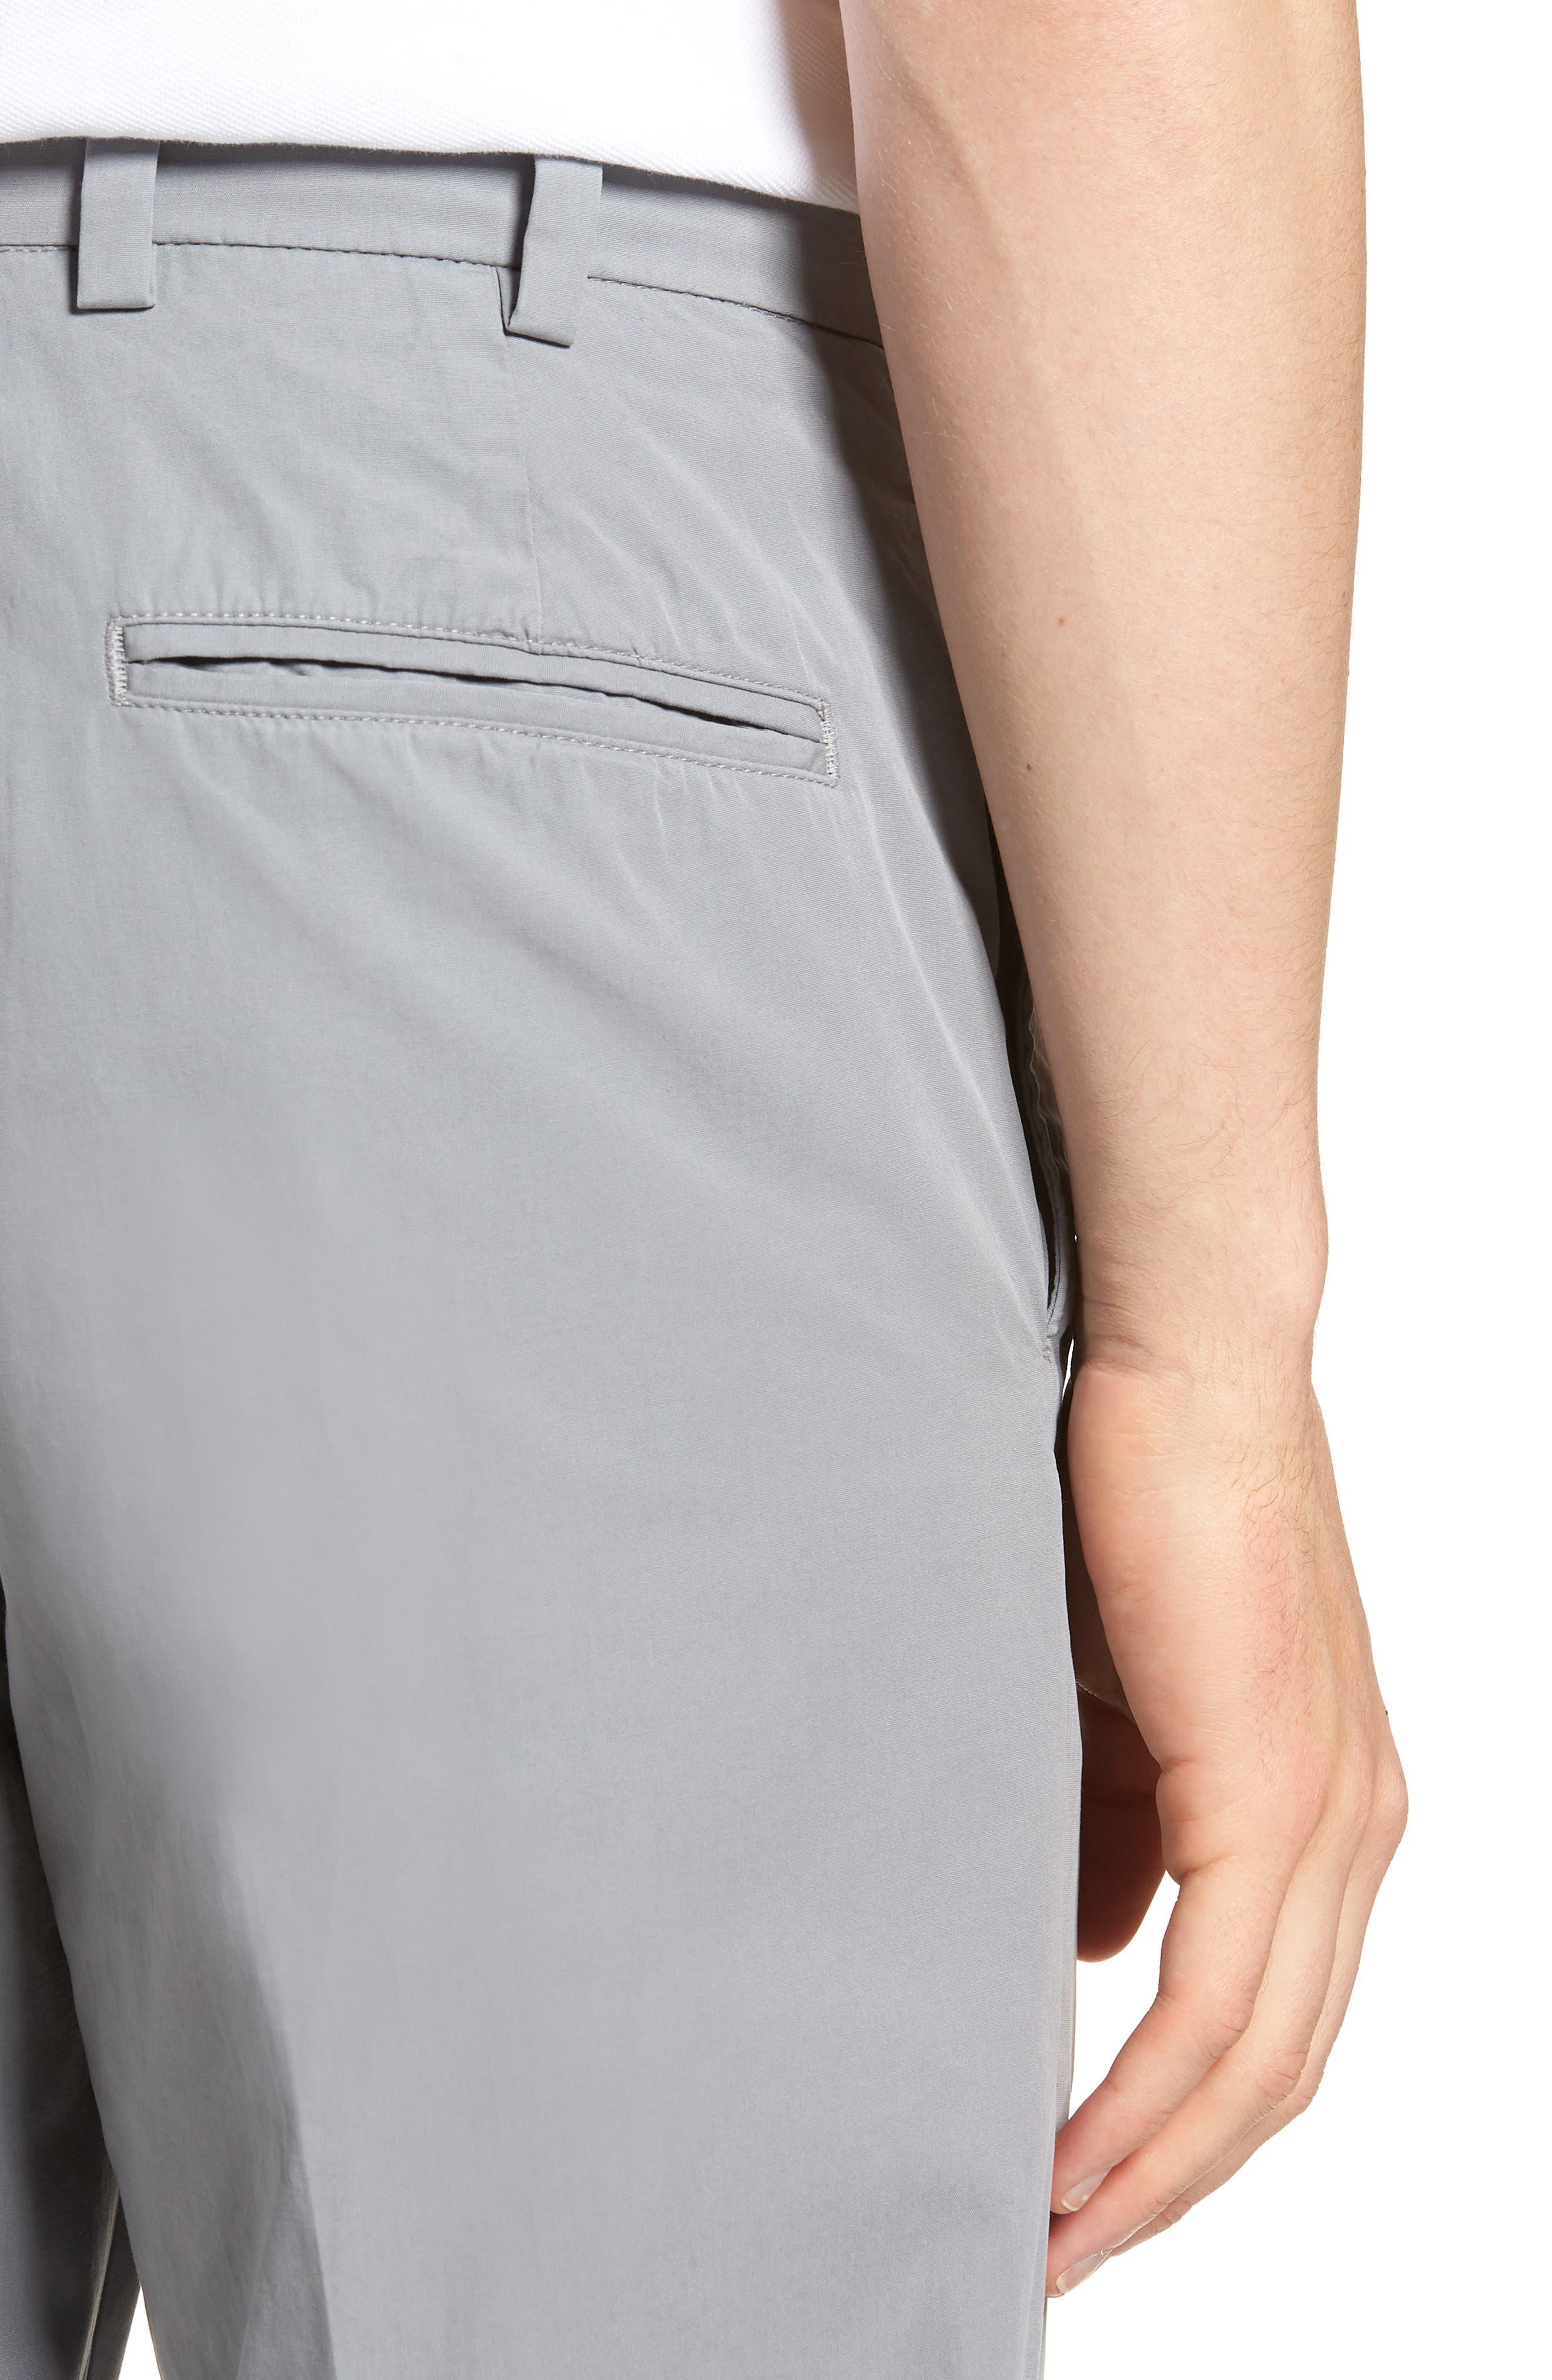 M2 Classic Fit Flat Front Tropical Cotton Poplin Pants,                             Alternate thumbnail 4, color,                             Nickel